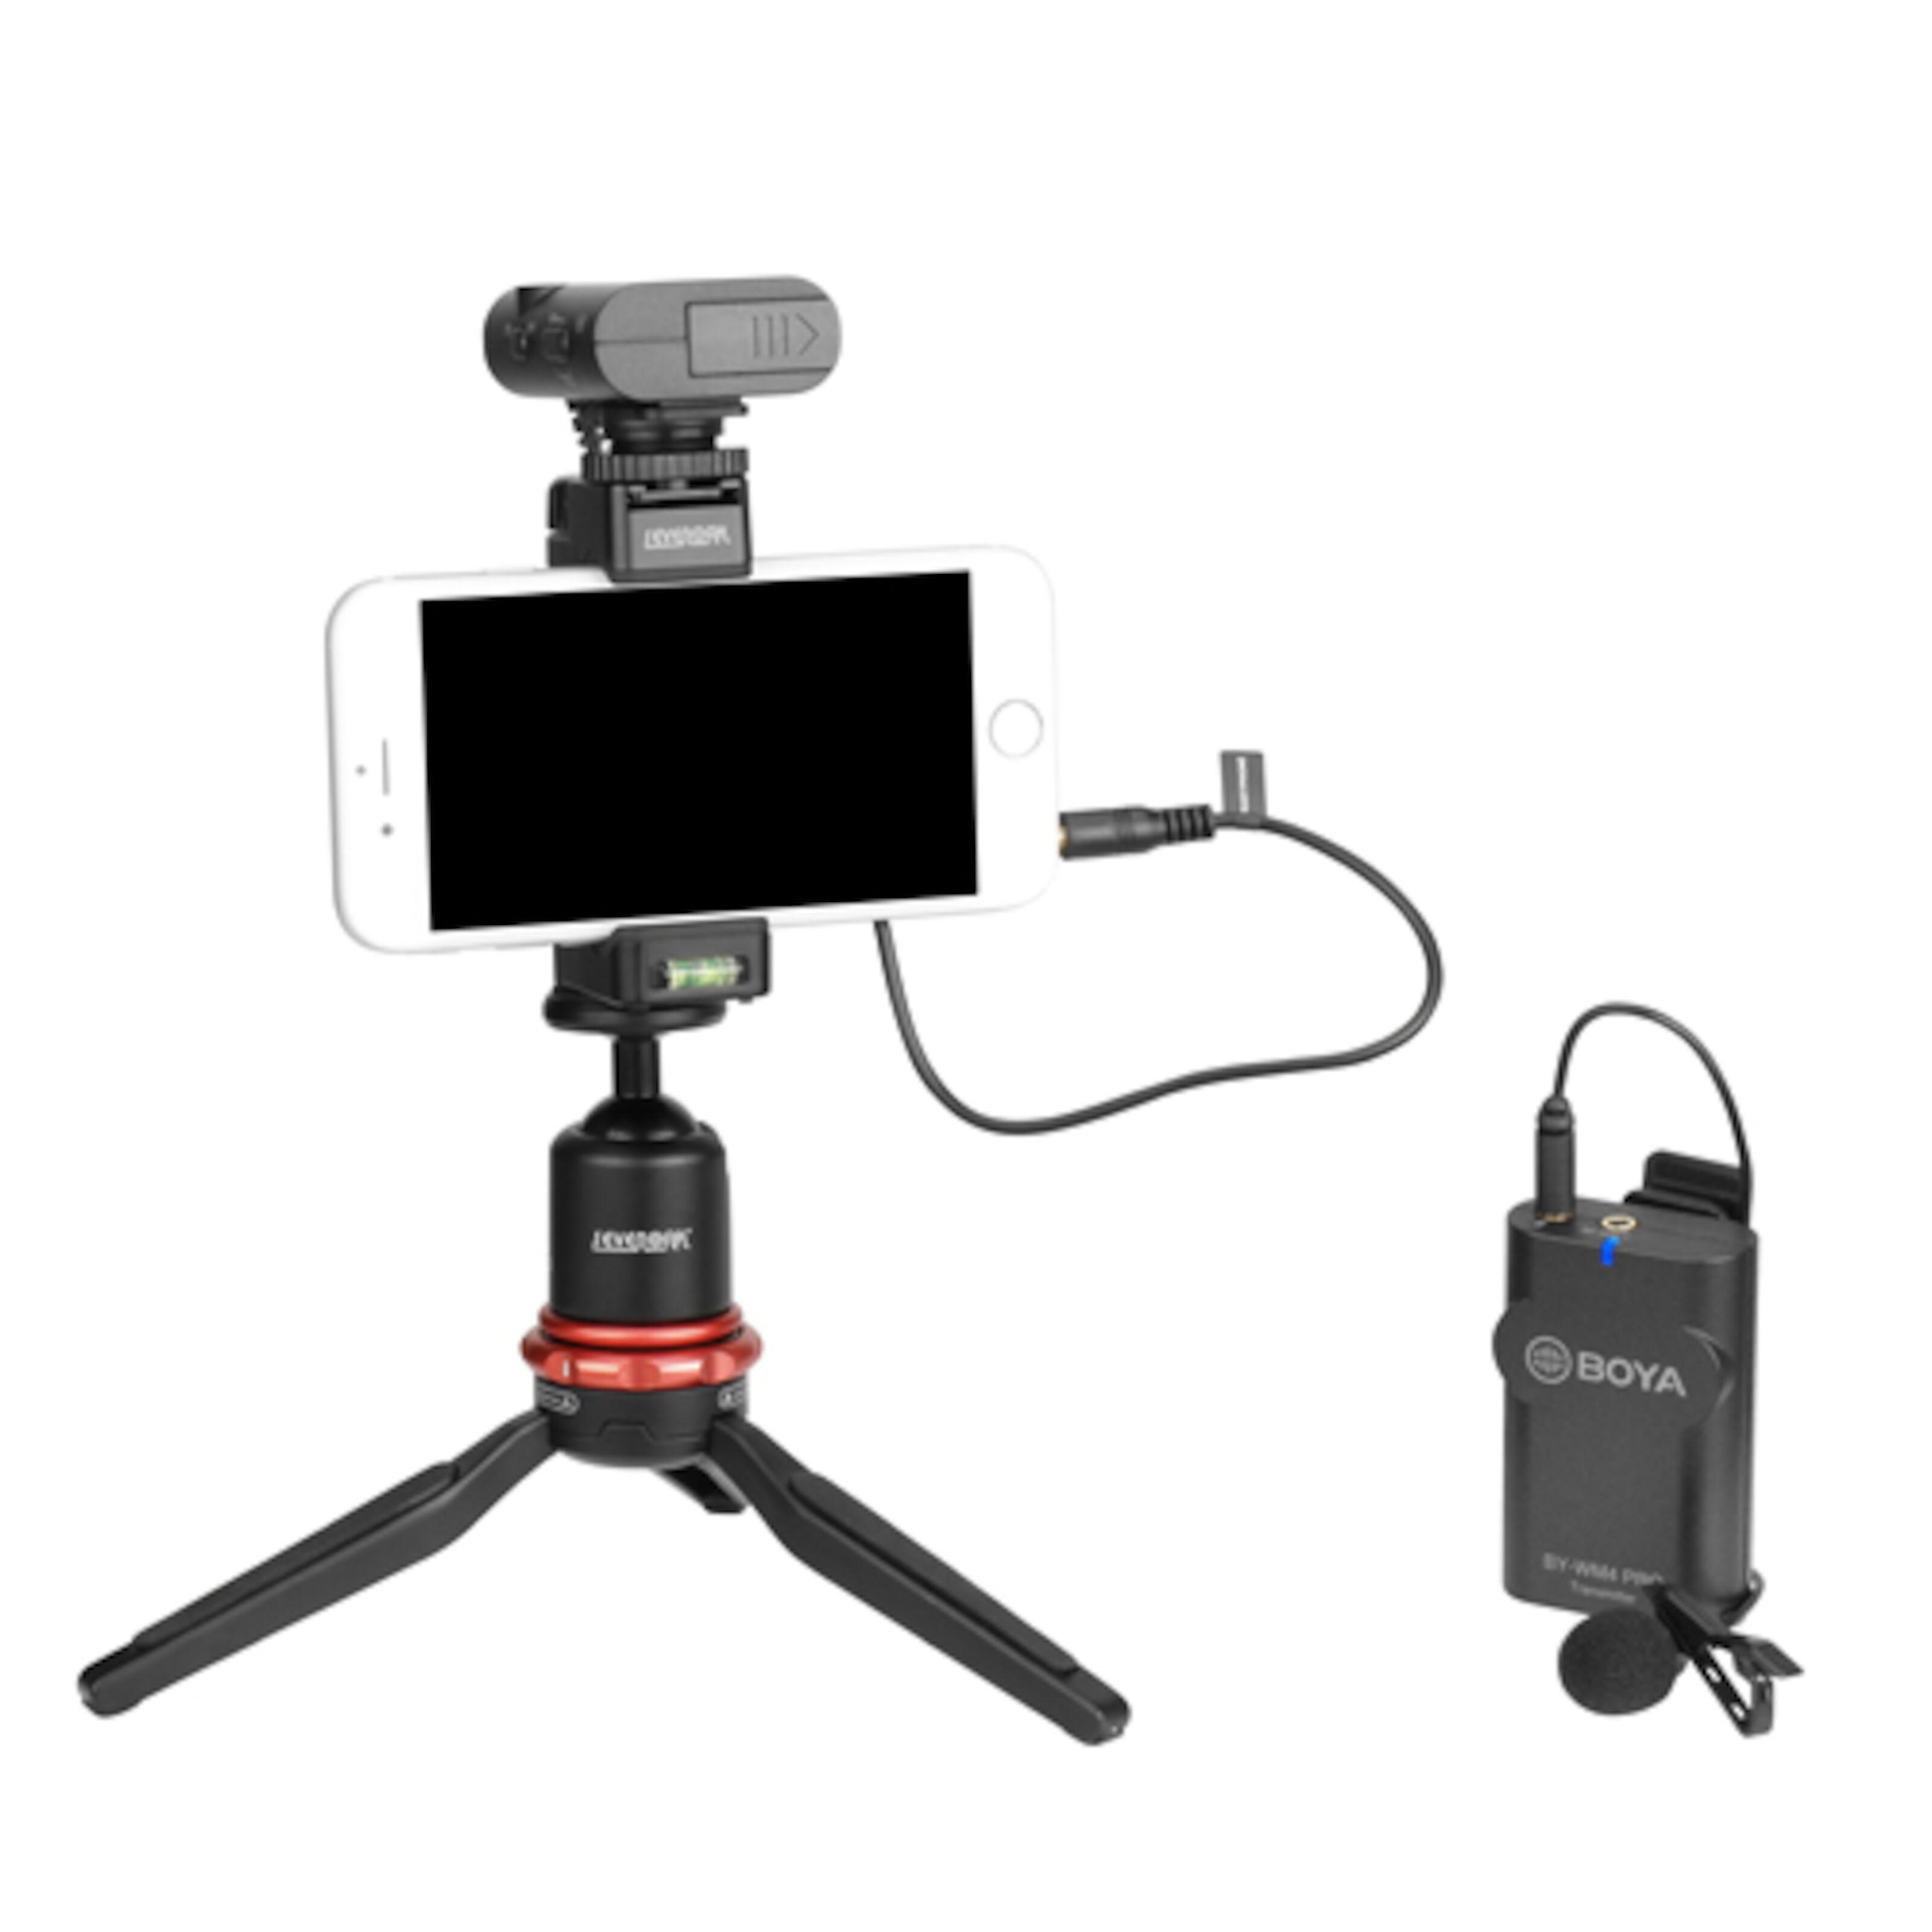 BY WM4 PRO Boya trådløs myggmikrofon til kamera Kjøp